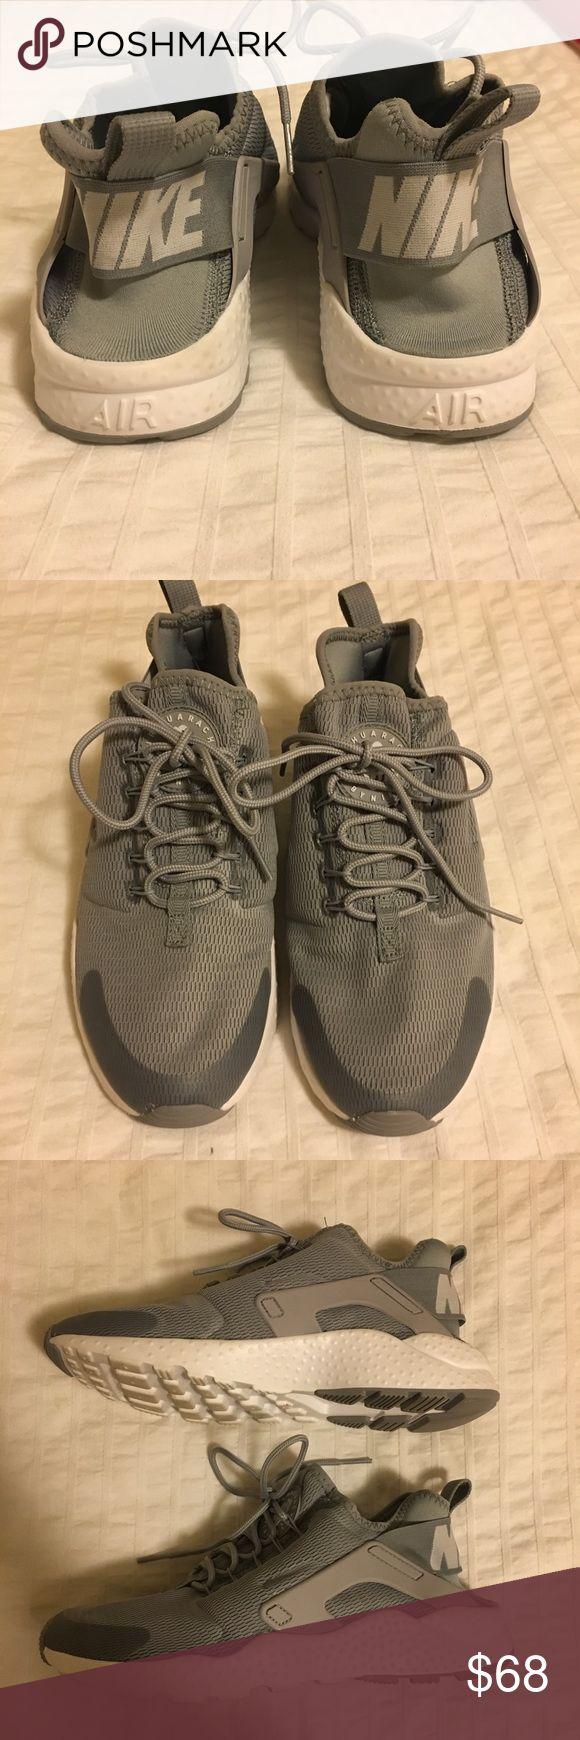 Nike huarache's Grey like new Nike huarache's Grey like new Nike Shoes Sneakers